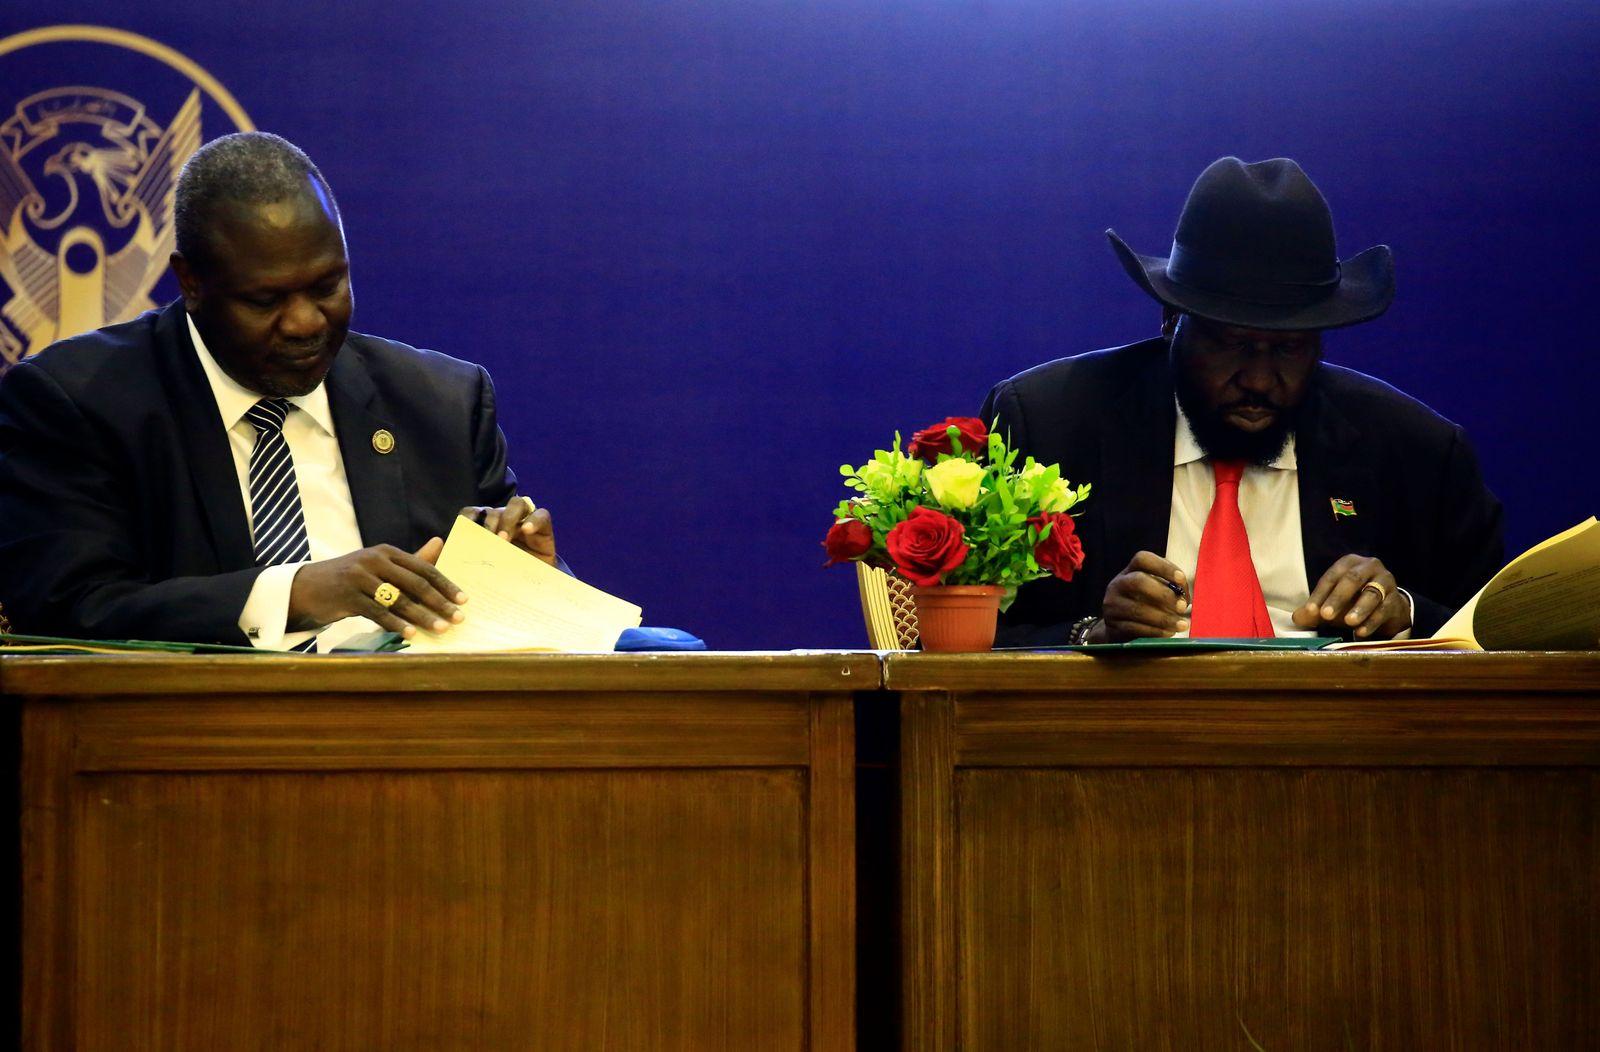 SUDAN-SSUDAN-CONFLICT-TALKS